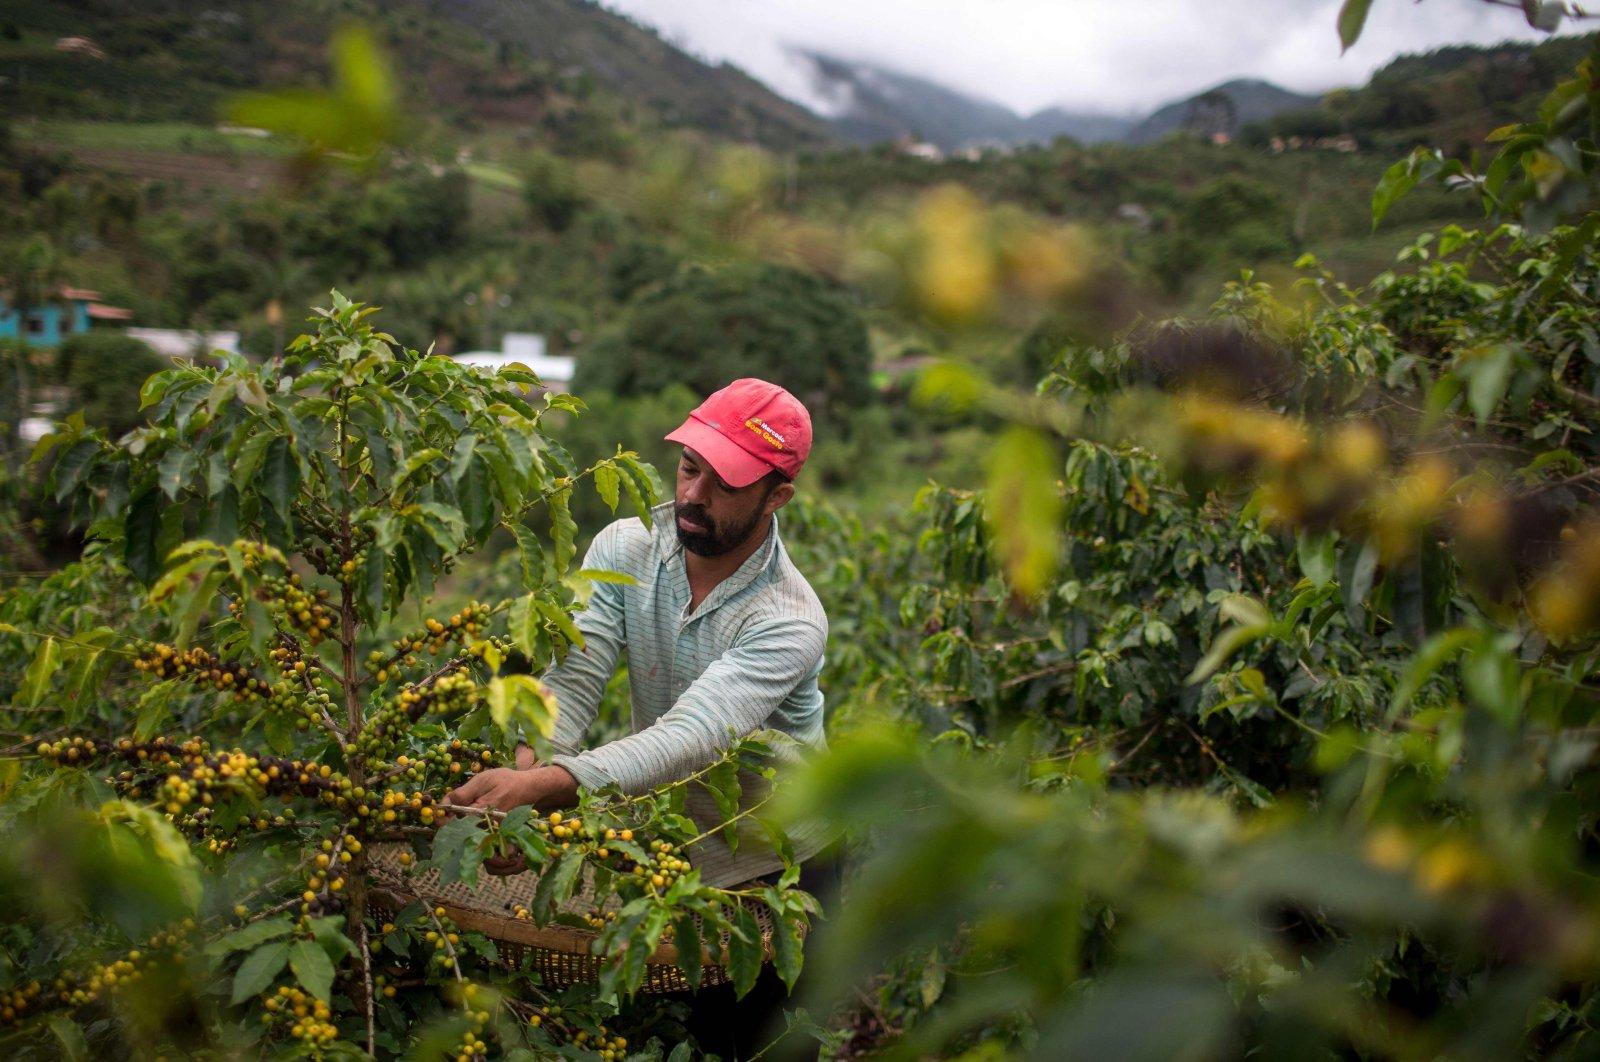 Farmer Joao Paulo Rodrigo, 33, picks coffee beans on his family farm in Forquilha do Rio, municipality of Dores do Rio Preto, Espirito Santo, Brazil, Nov. 23, 2017. (AFP Photo)